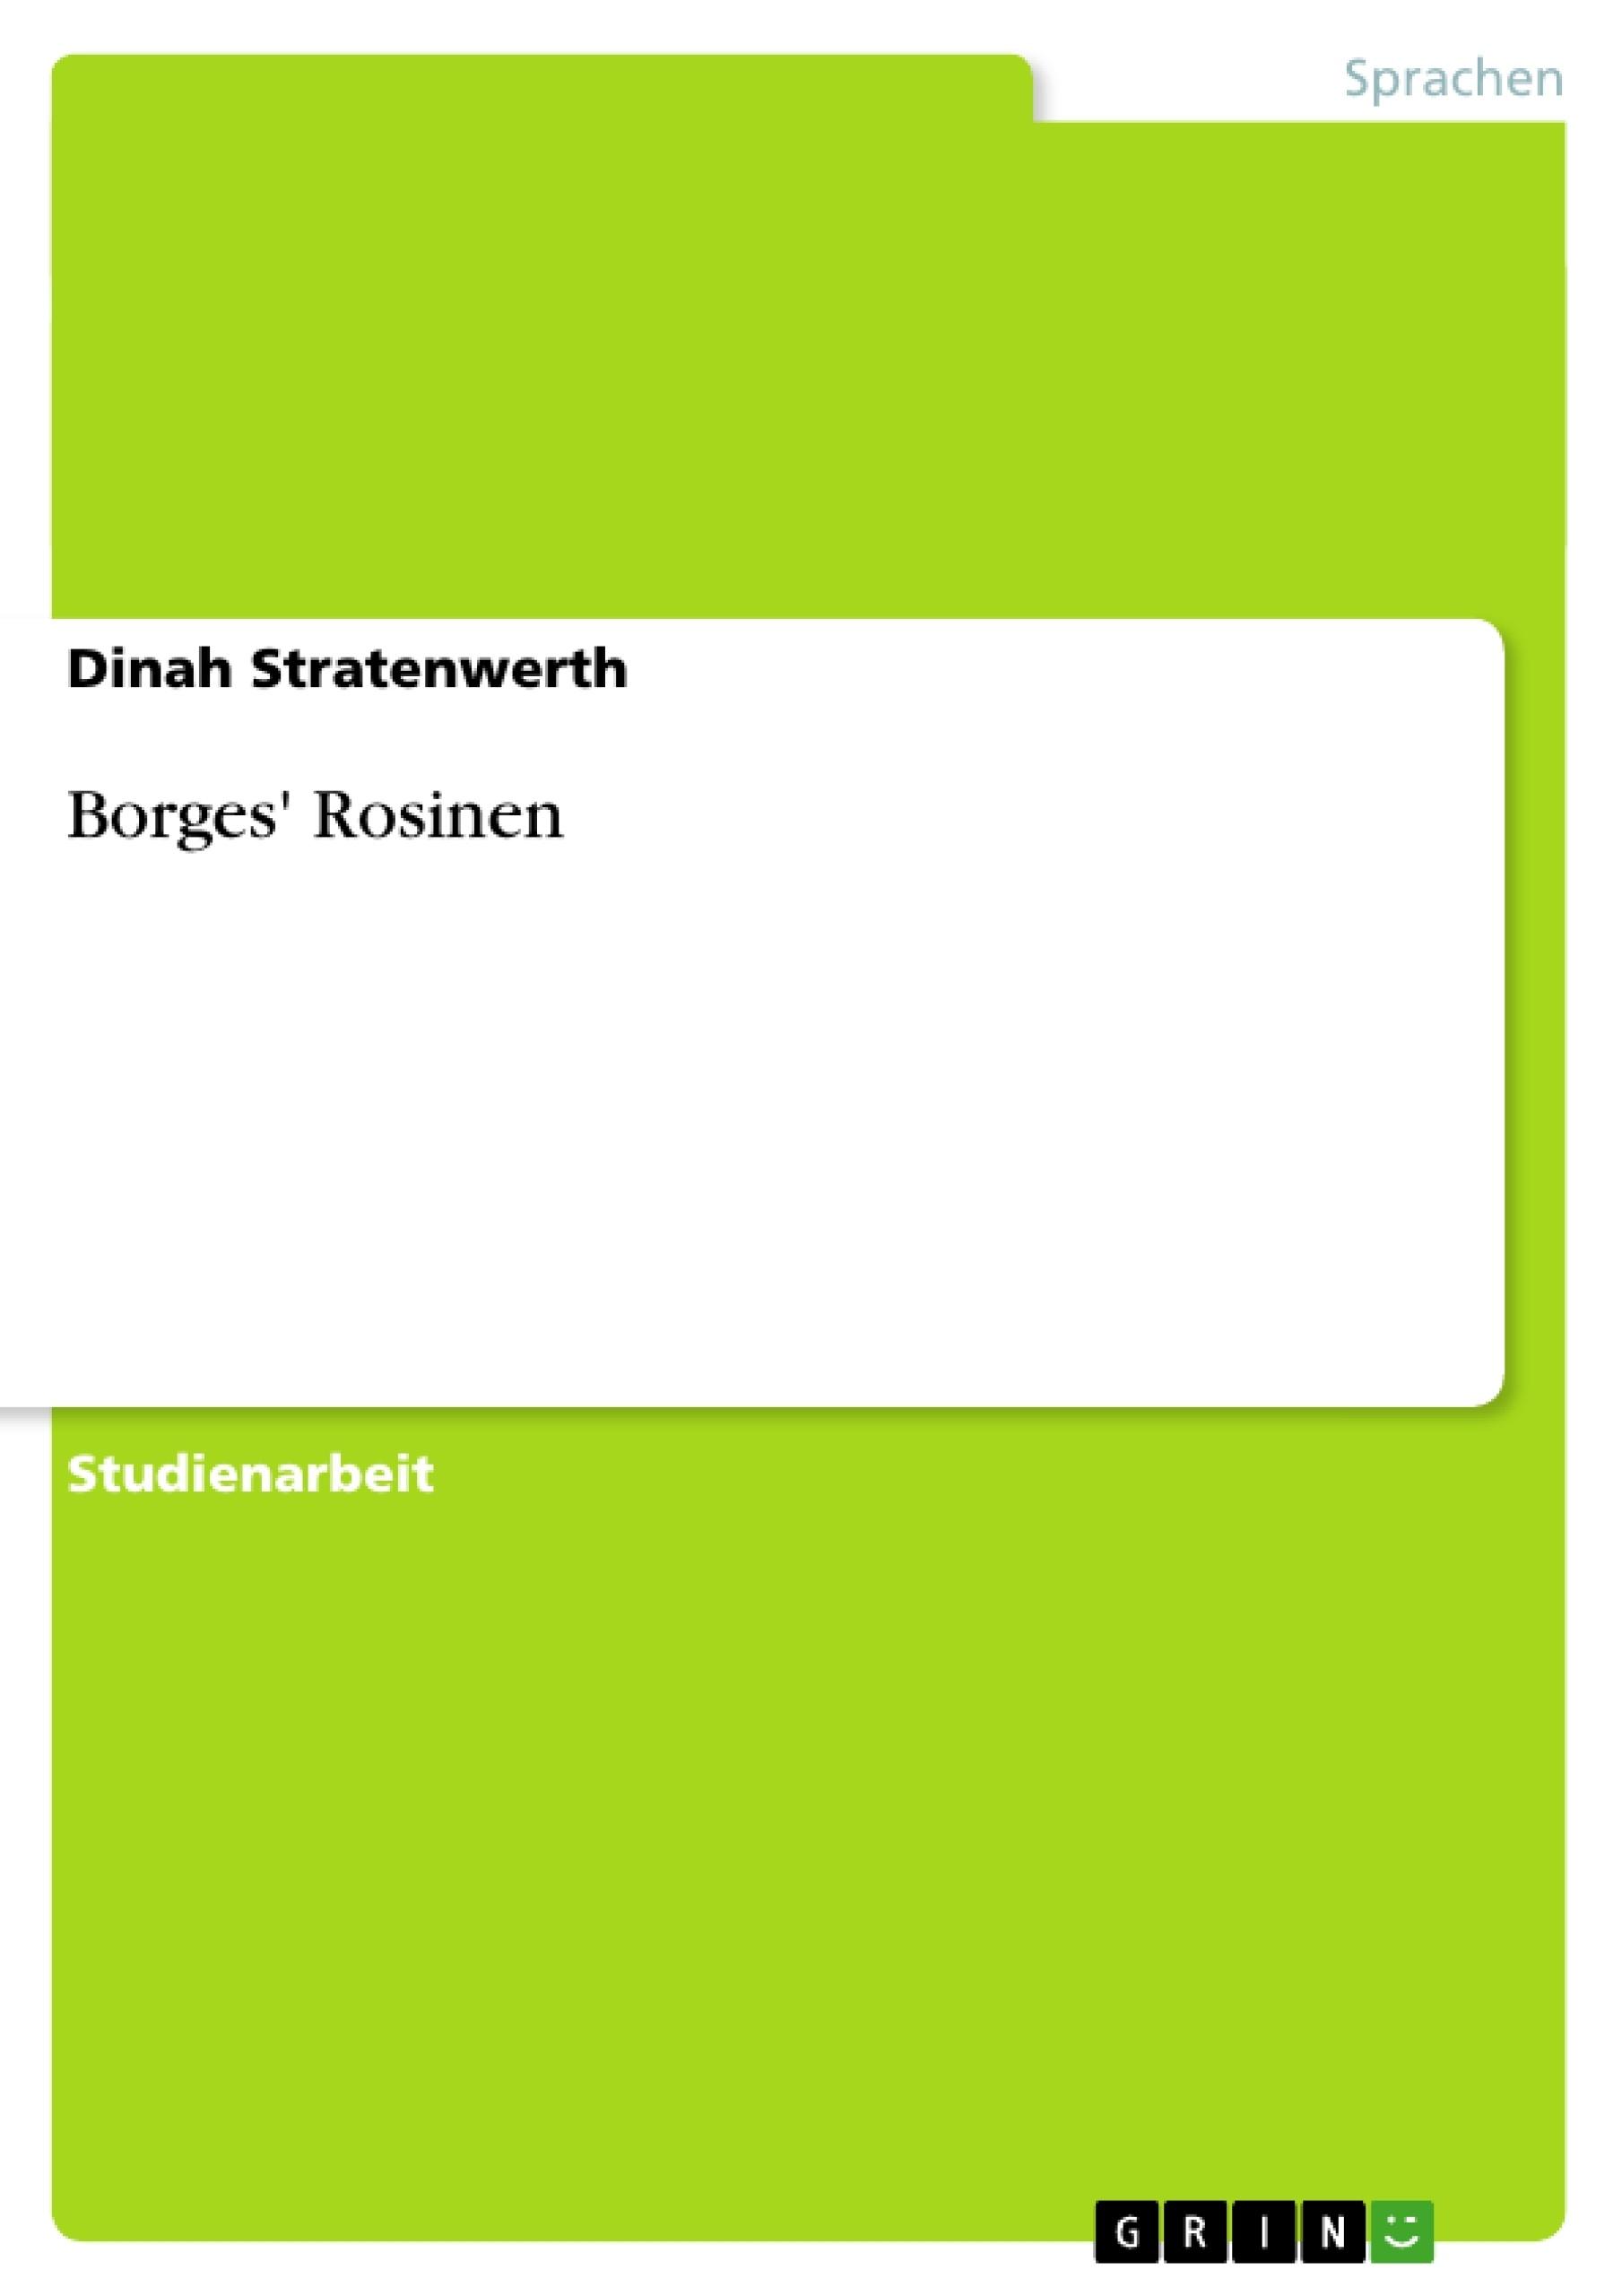 Titel: Borges' Rosinen